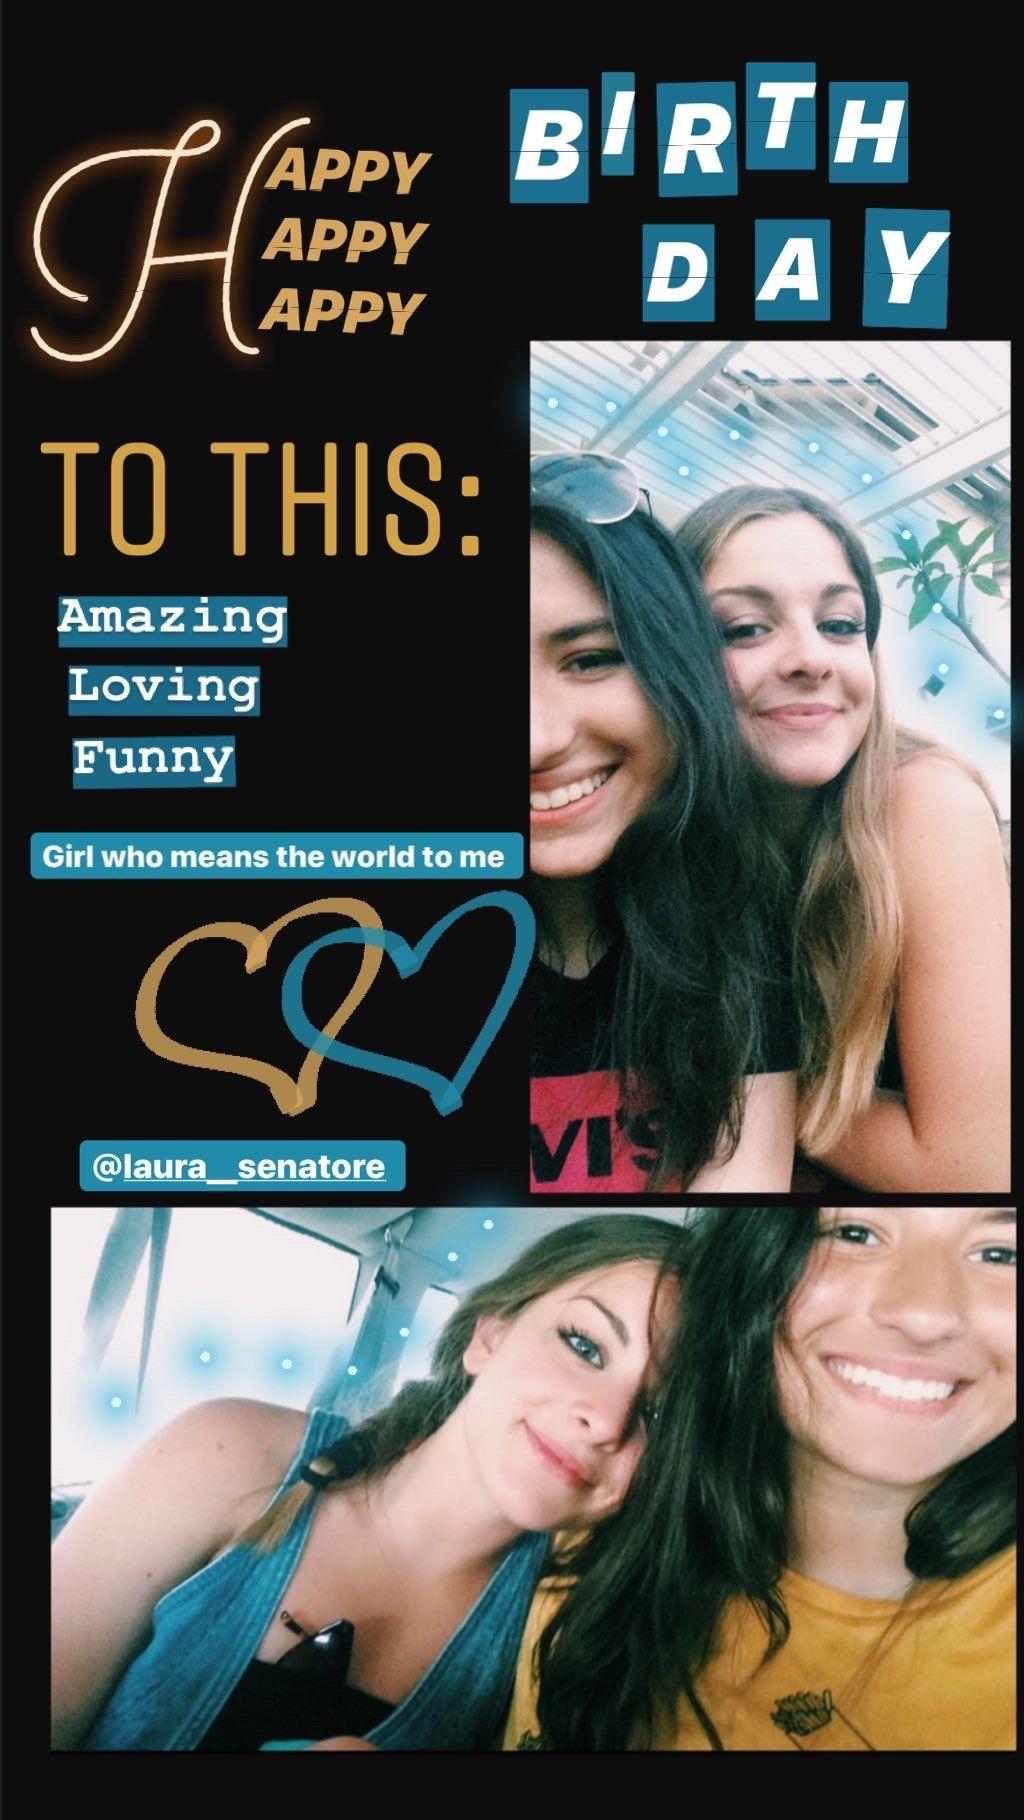 Livia Bortot Birthday Post Instagram Selfie Ideas Instagram Instagram Photo Ideas Posts